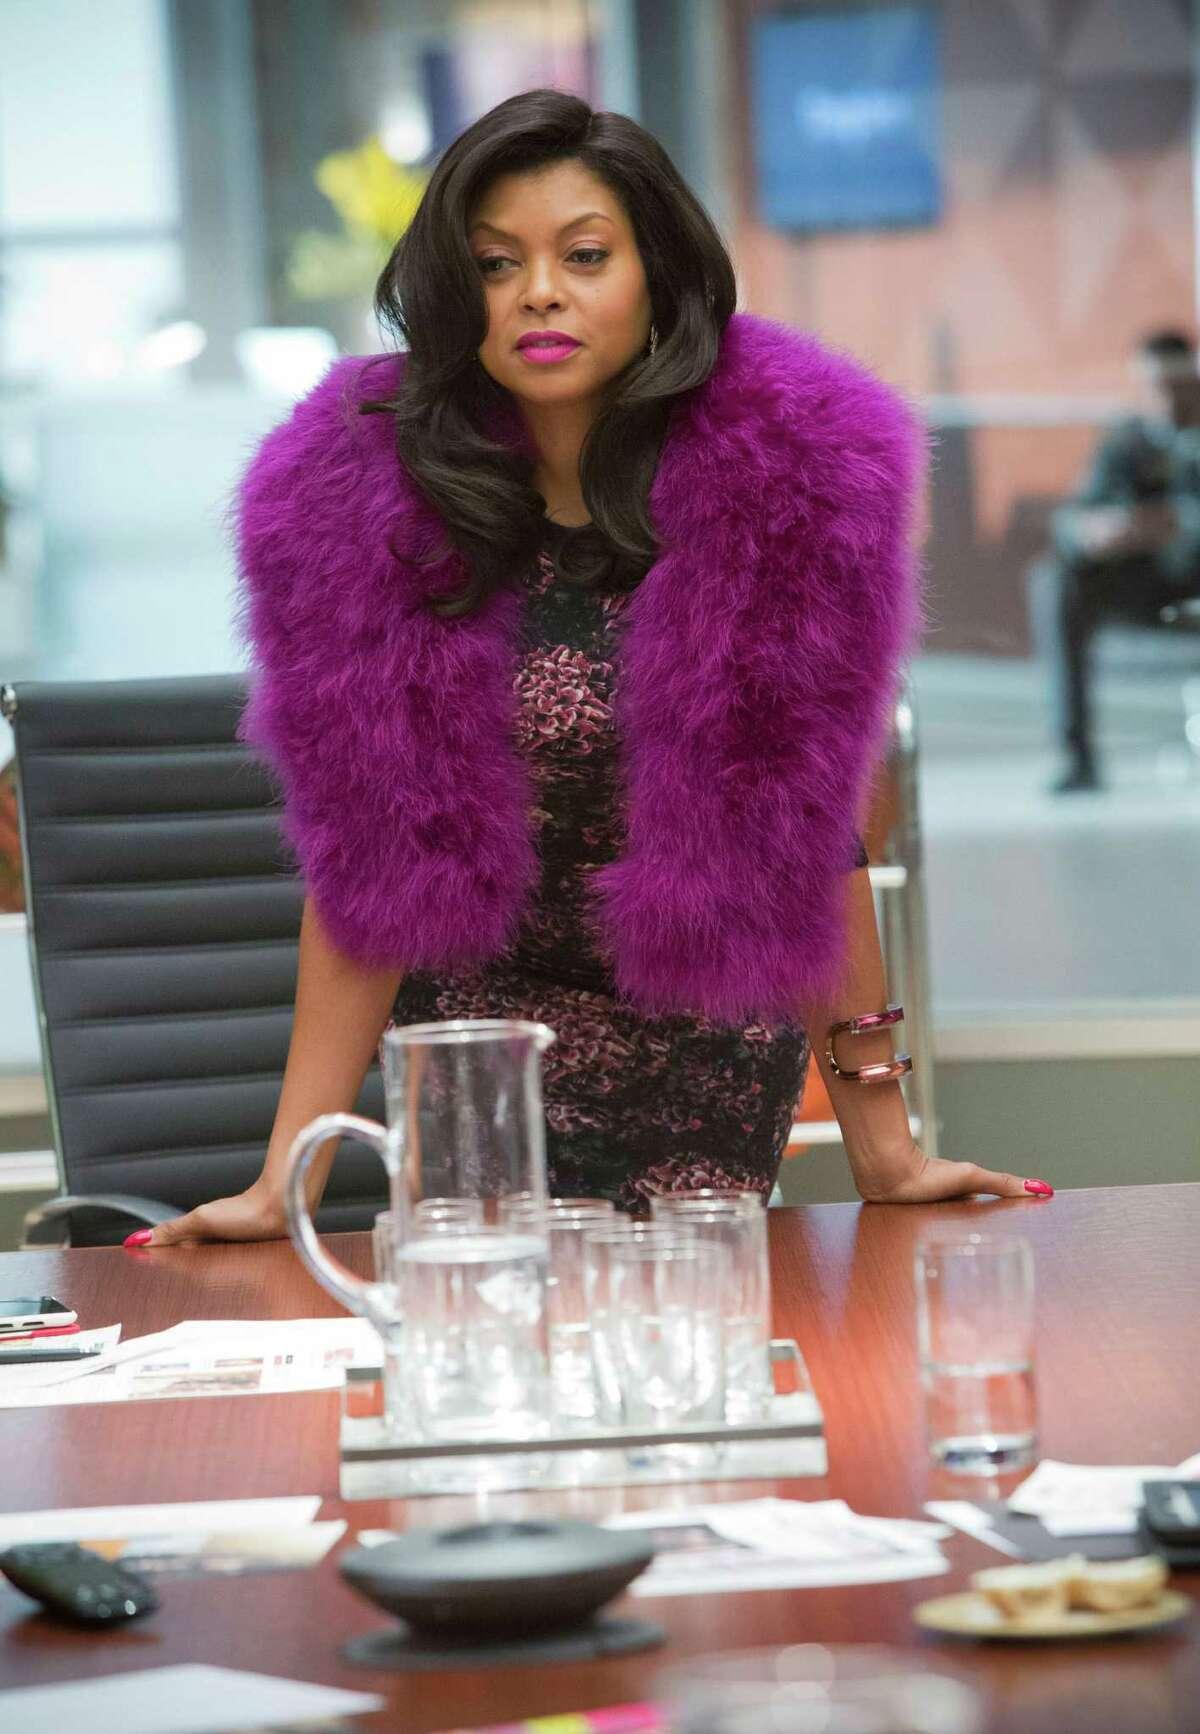 Cookie (Taraji P. Henson) demands attention in fur and fuchsia.